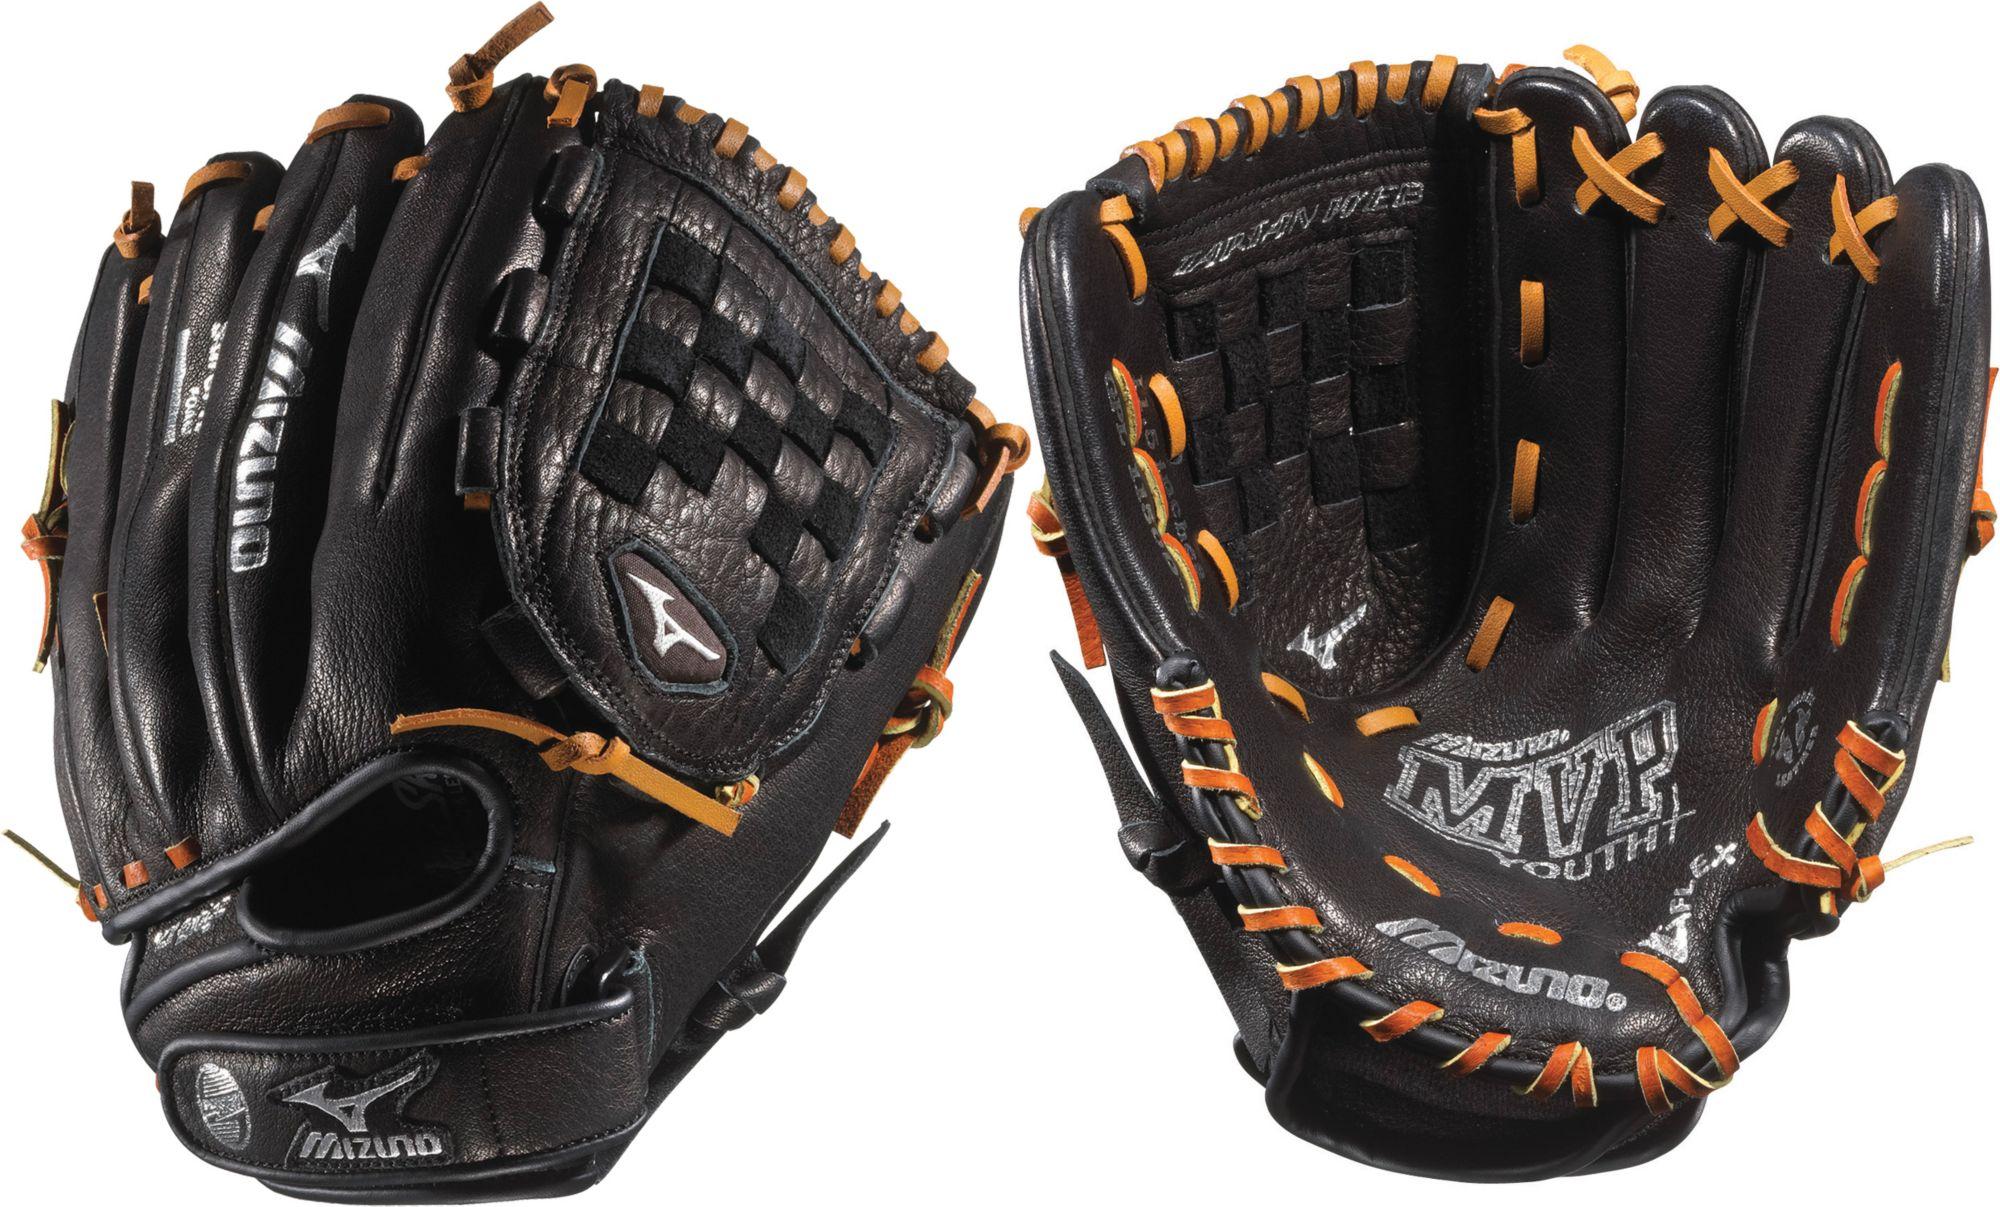 mizuno baseball gloves noimagefound ??? IQQQVDC